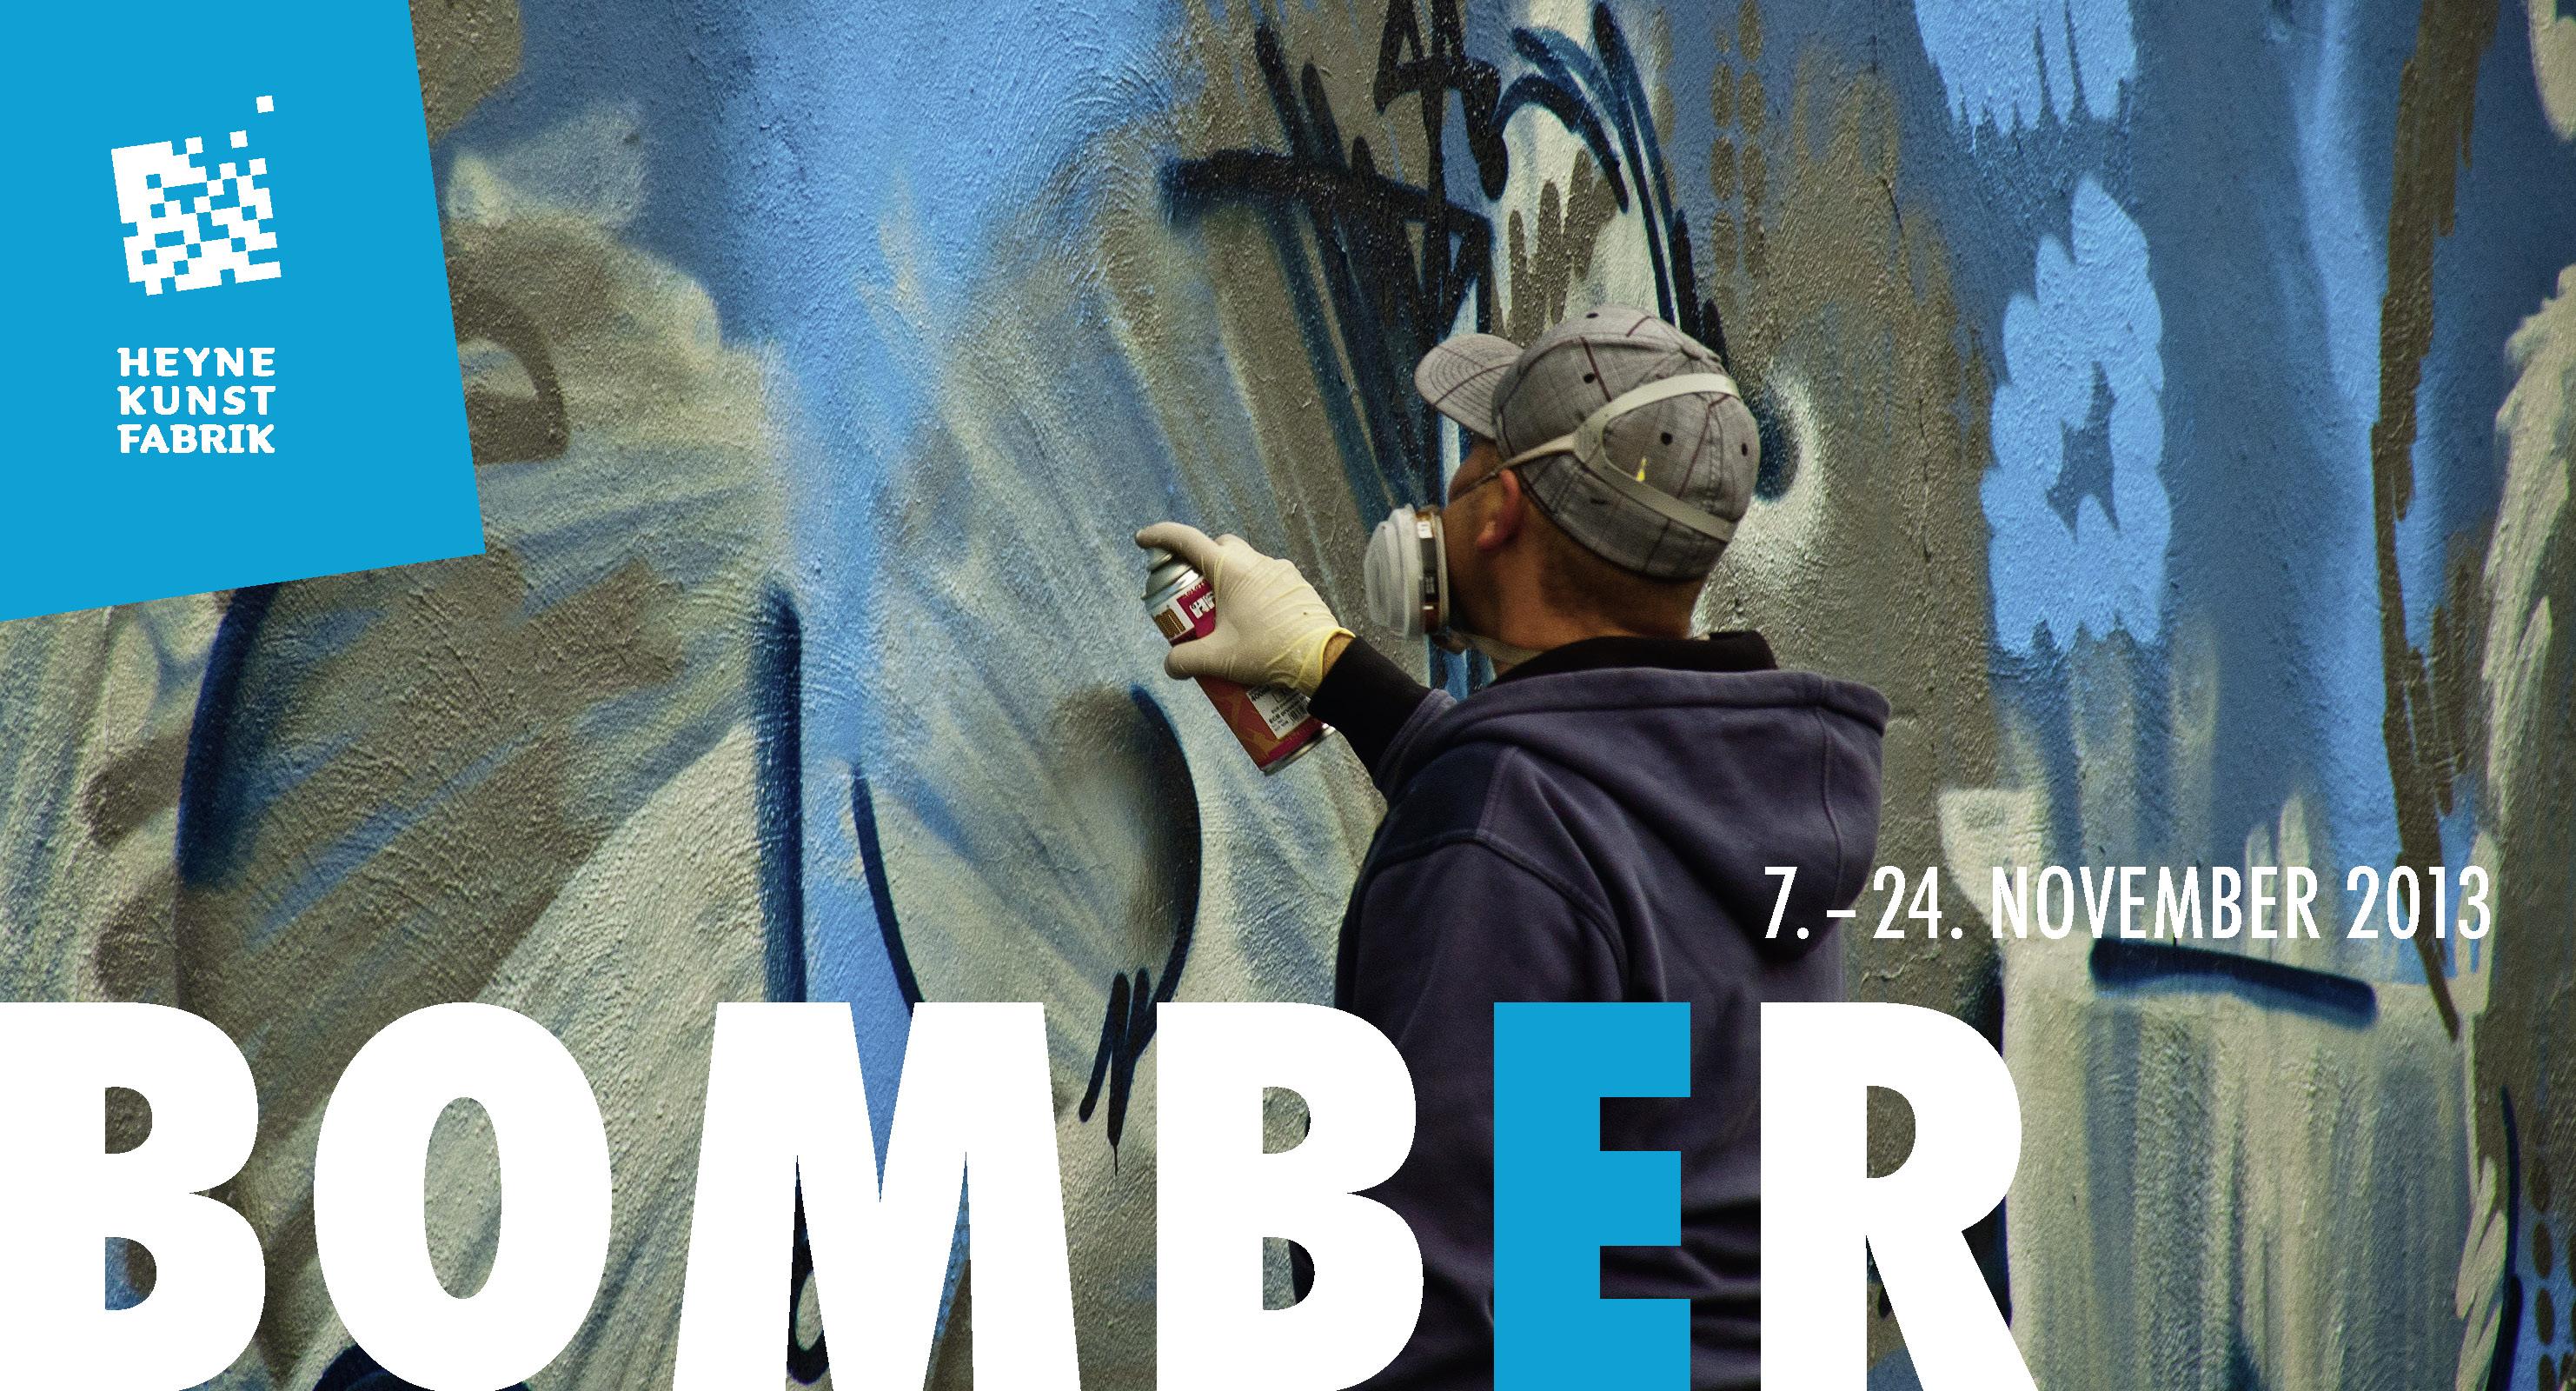 2013 – 25 Jahre Bomber